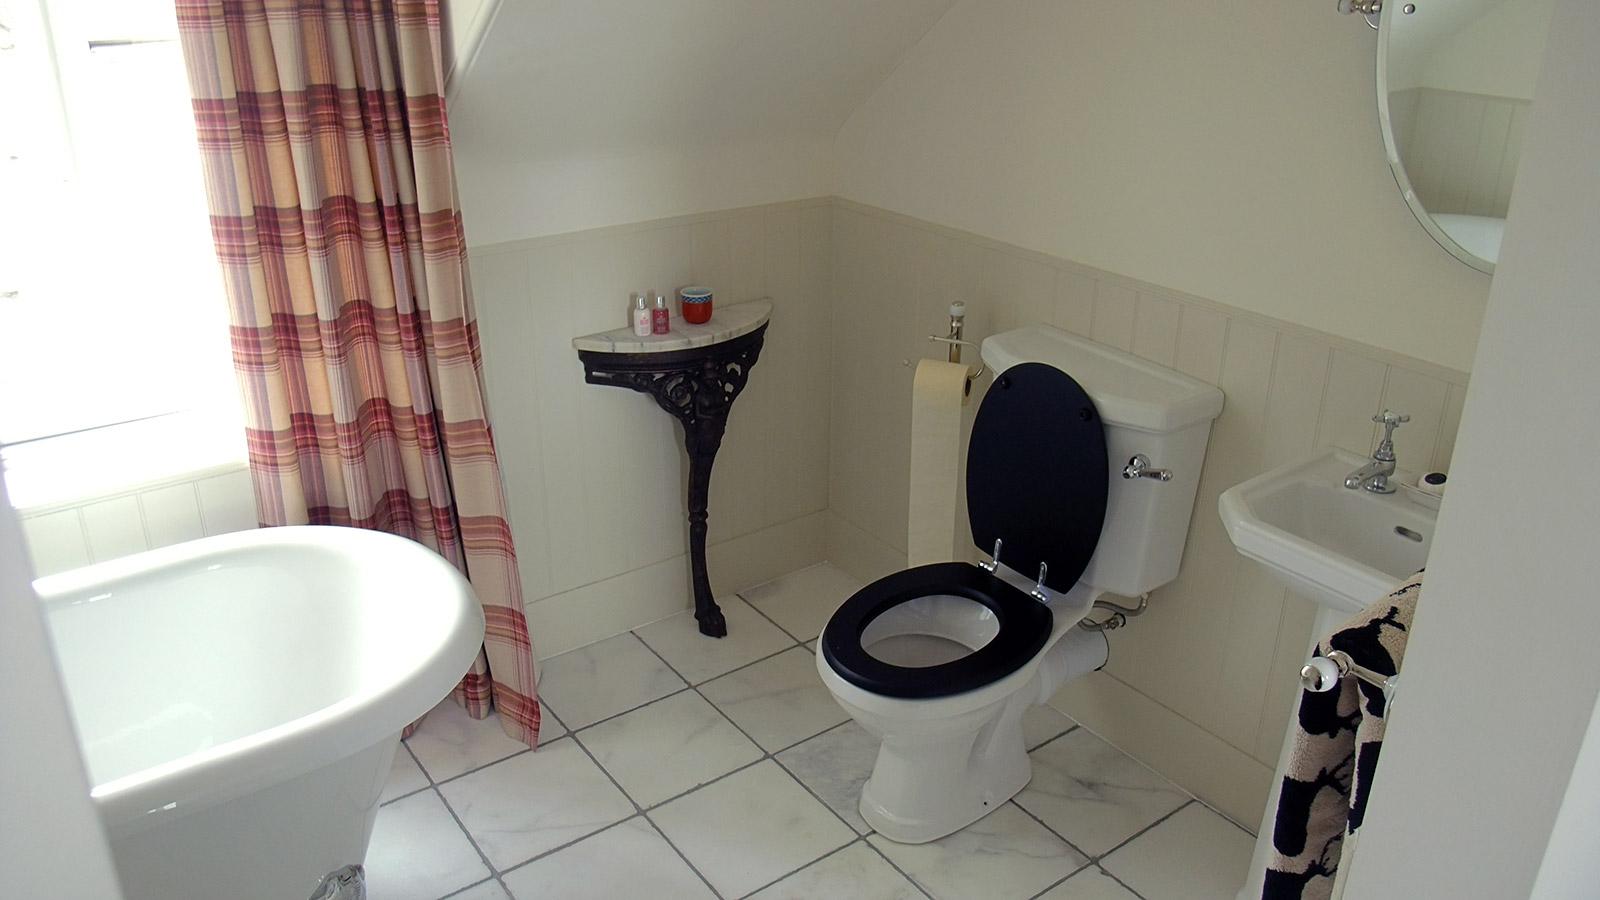 mat cover a top anti rug set popular bathroom slip toilet toielt seat duvet product modern